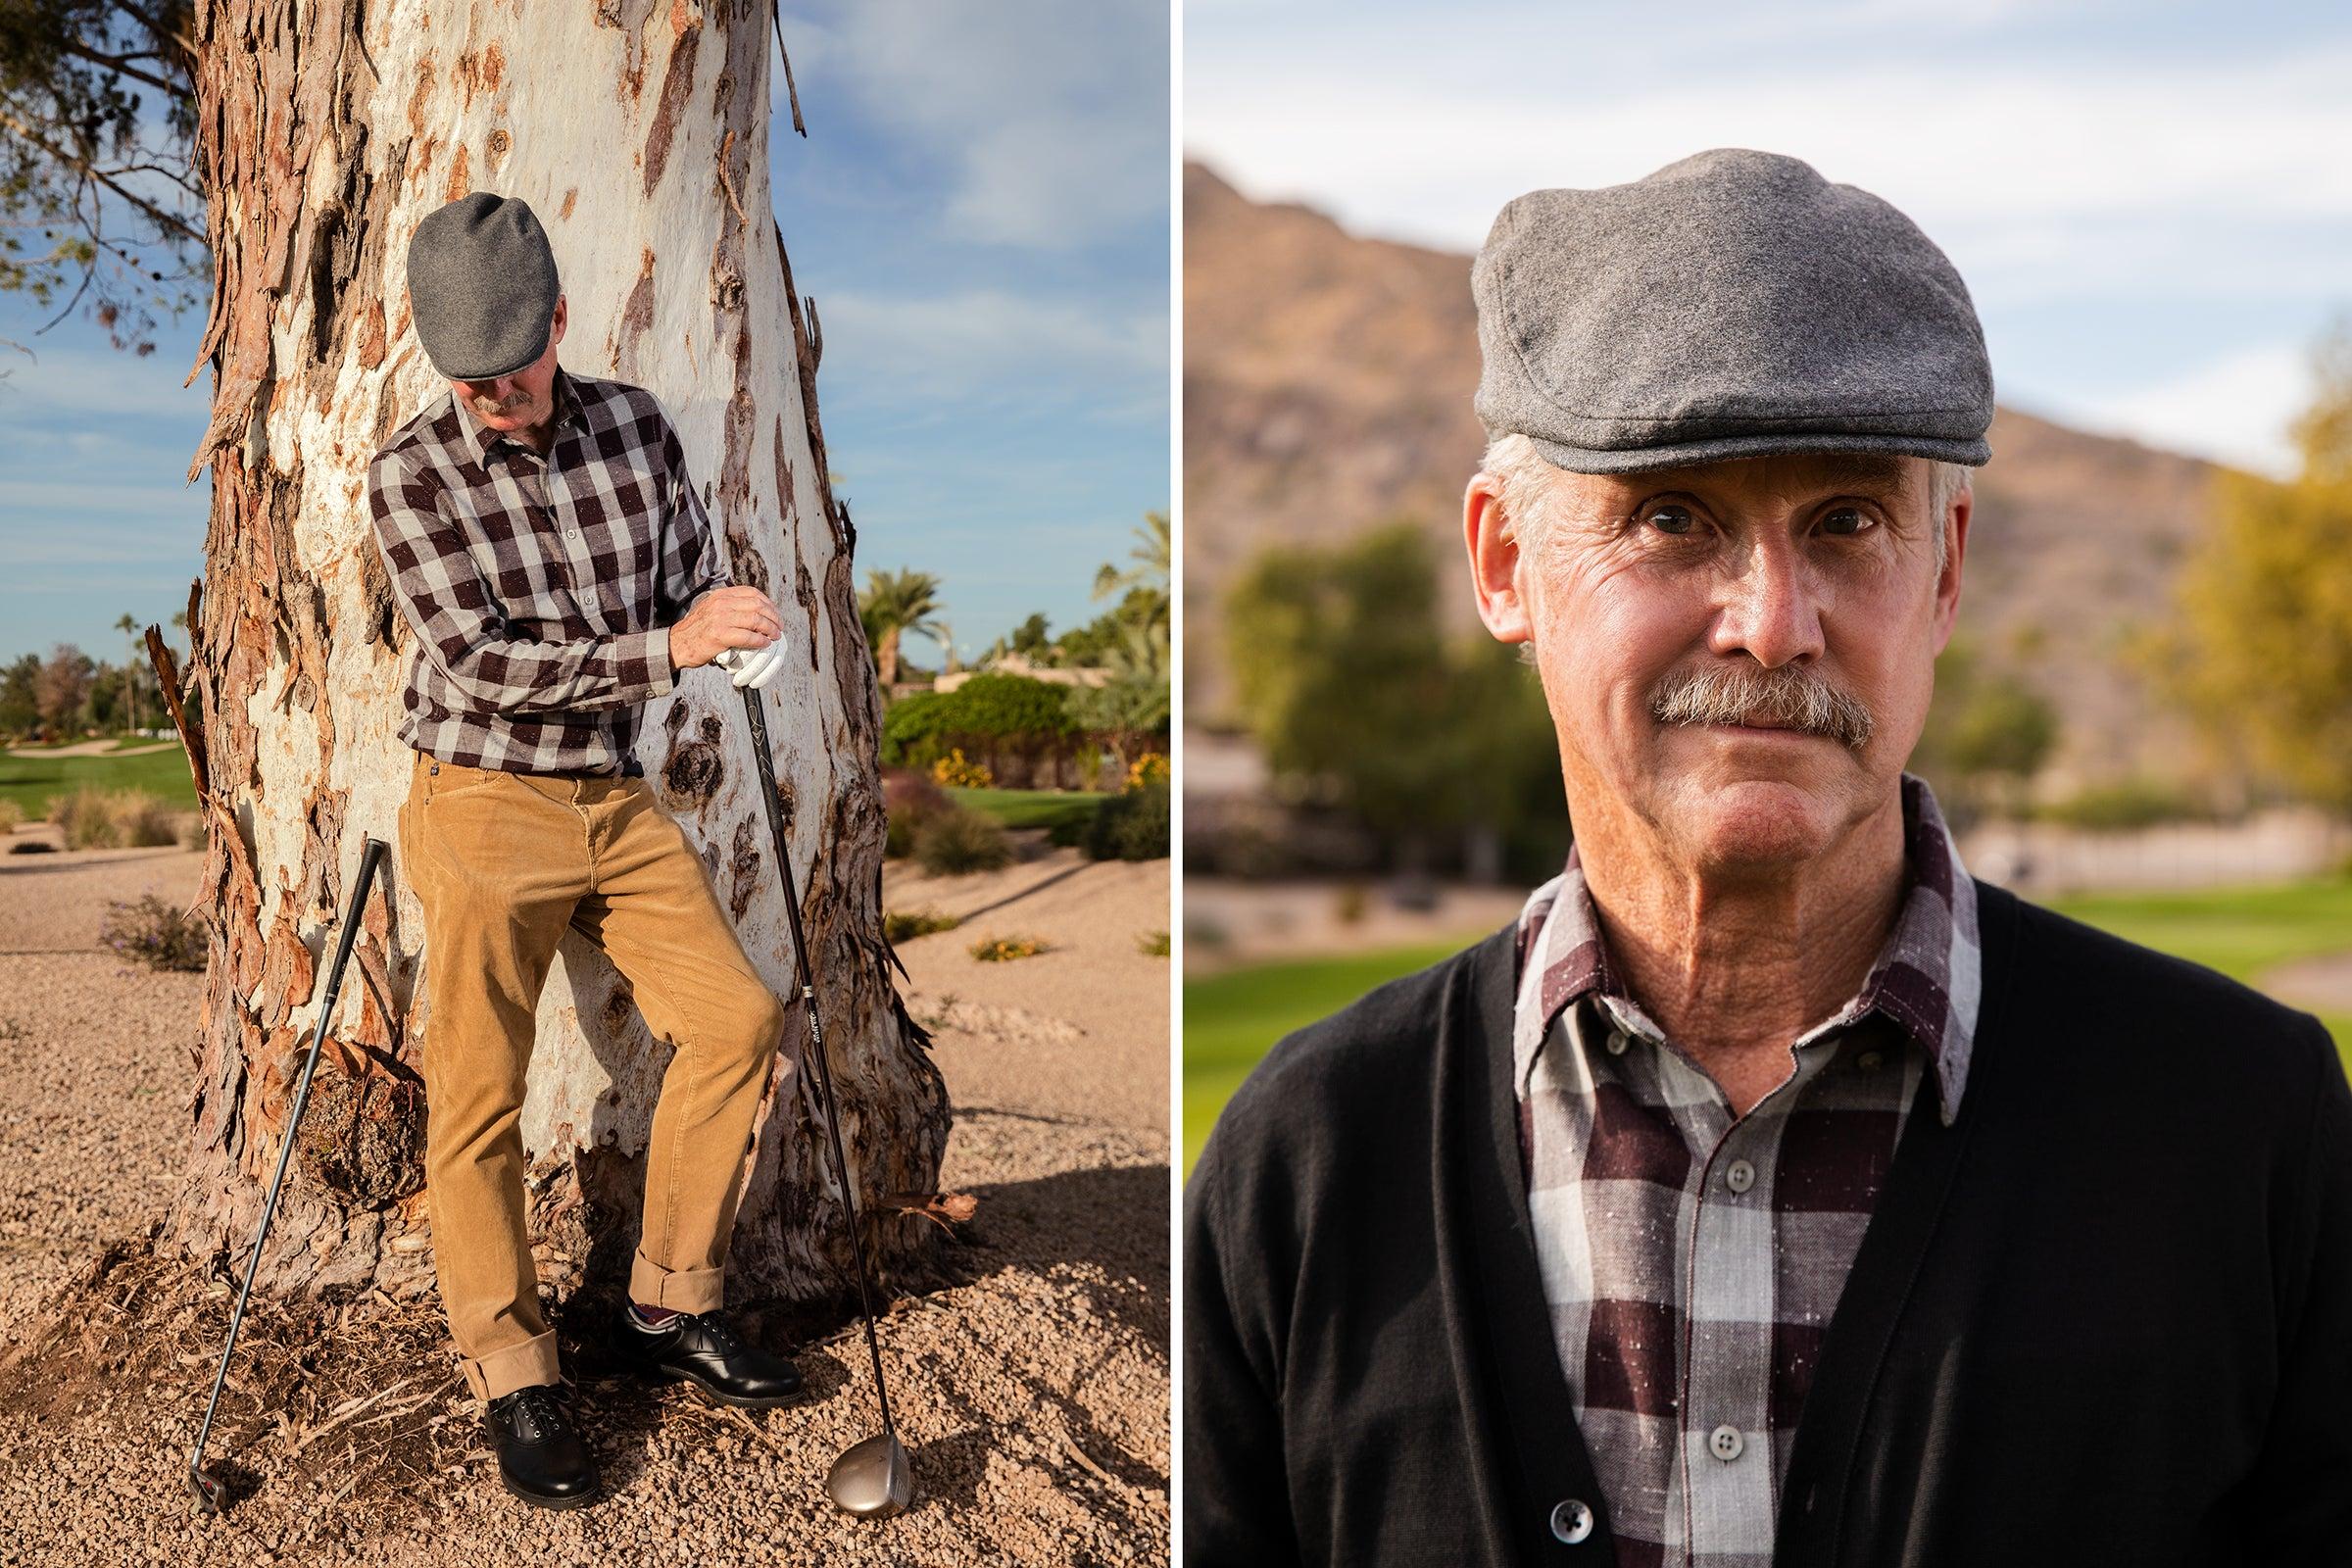 The author at the Phoenician Golf Club, Scottsdale, Arizona